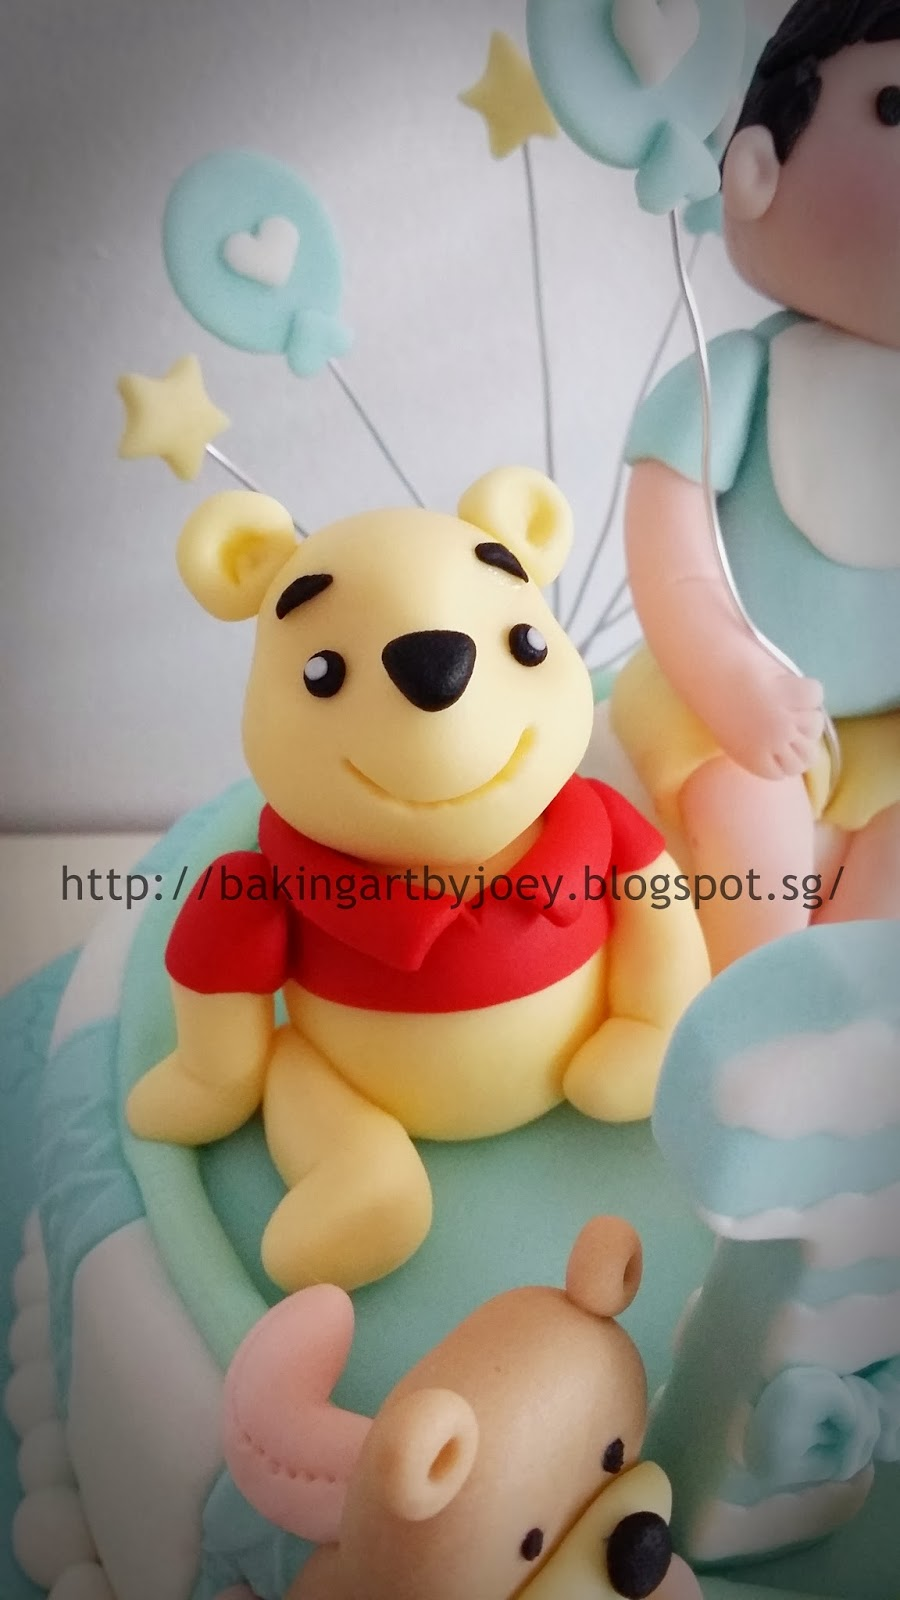 Baking Art By Joey 3d Winnie The Pooh First Birthday Fondant Cake